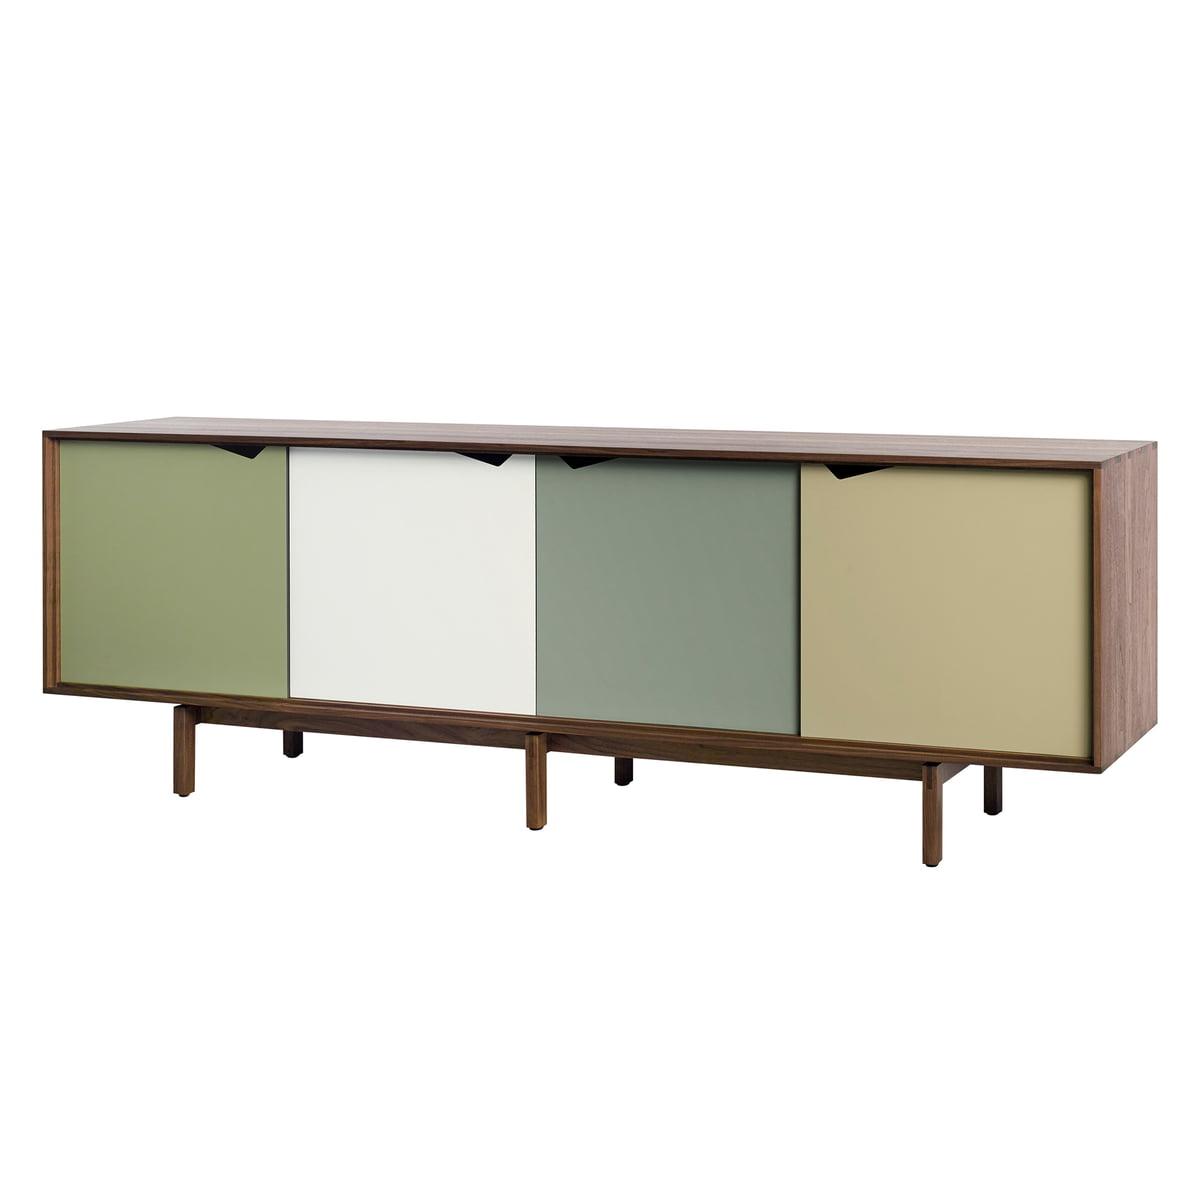 andersen furniture s1 sideboard walnuss ge lt t ren pale olive blassgr n alpino wei. Black Bedroom Furniture Sets. Home Design Ideas